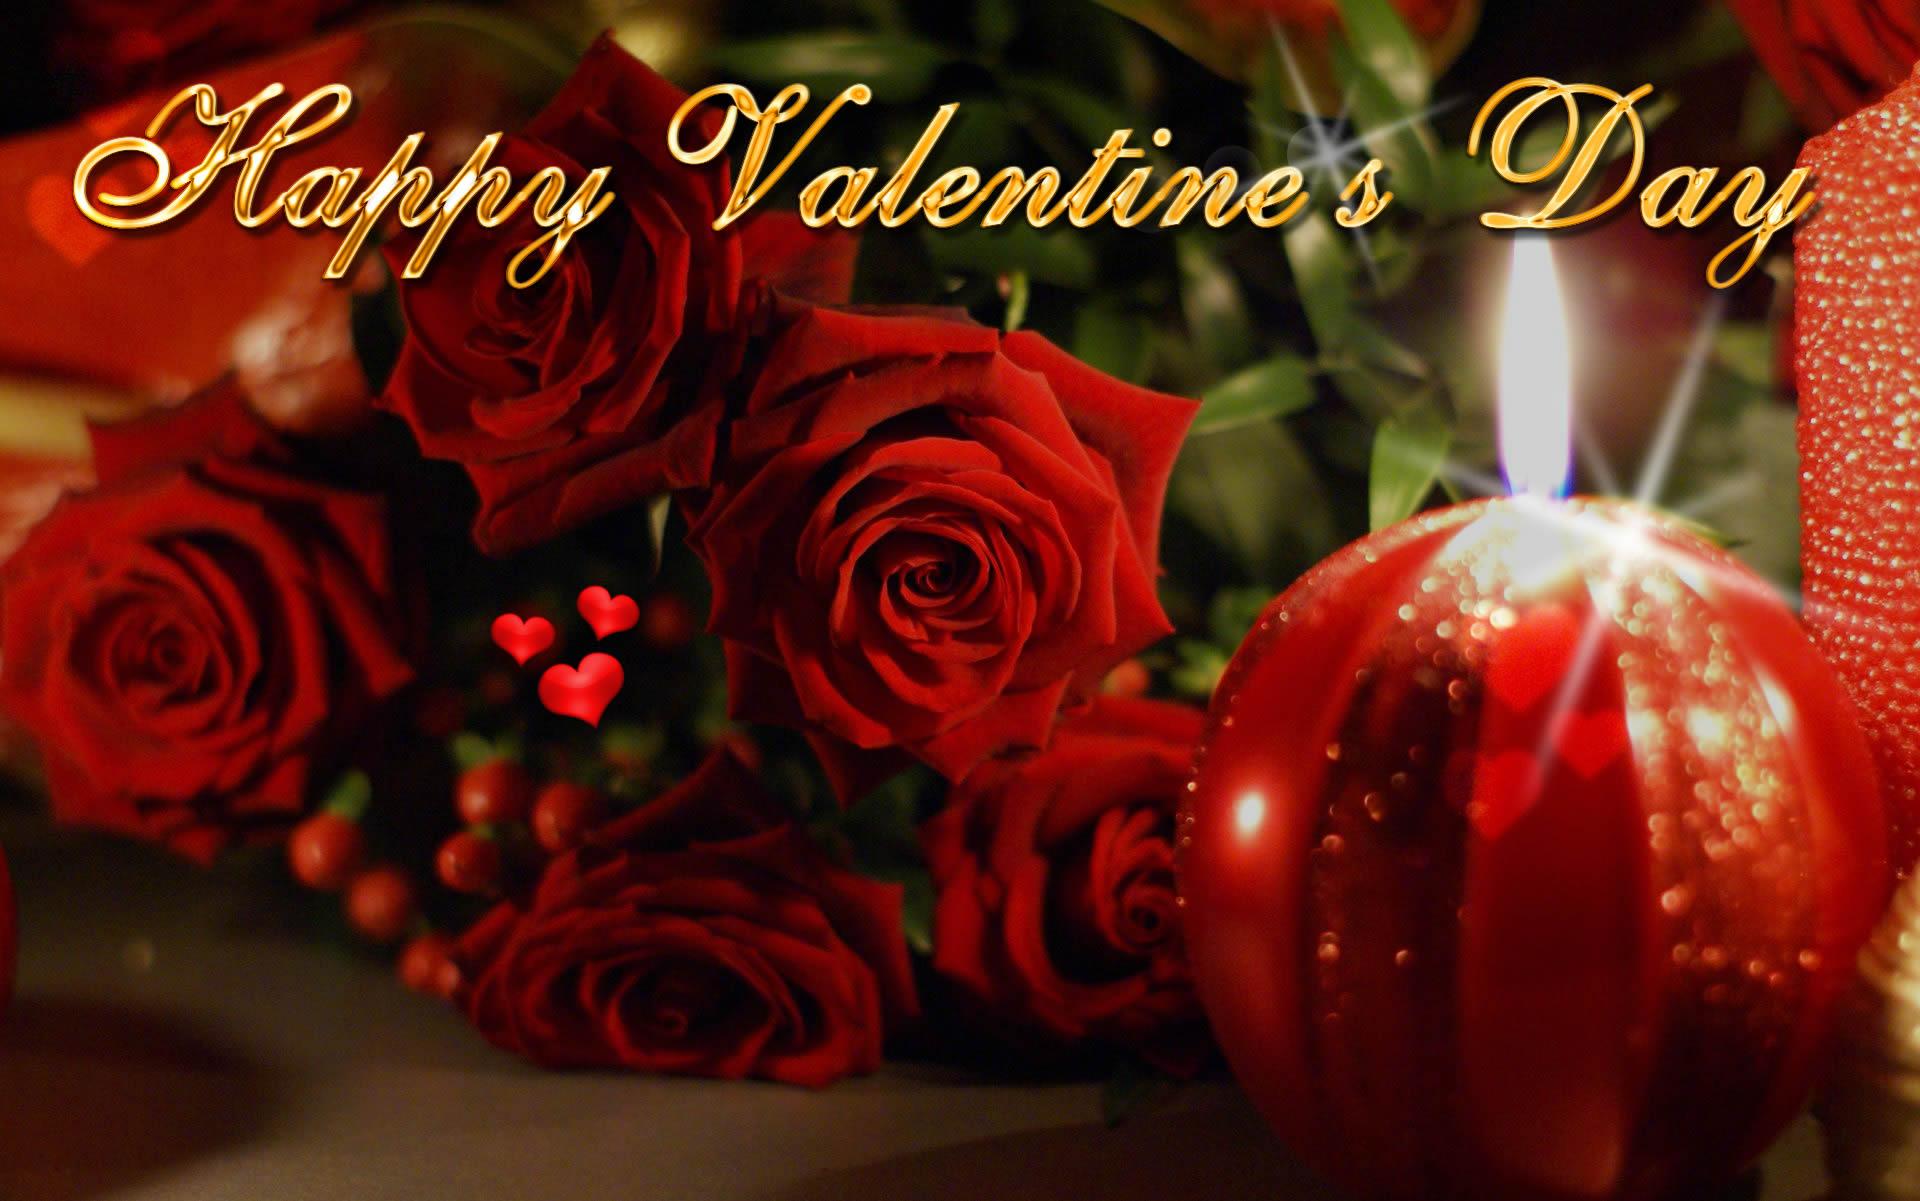 2018 happy valentines day whatsapp status and messages whatsapp happy valentines day 2016 whatsapp status and facebook messages whatsapp lover m4hsunfo